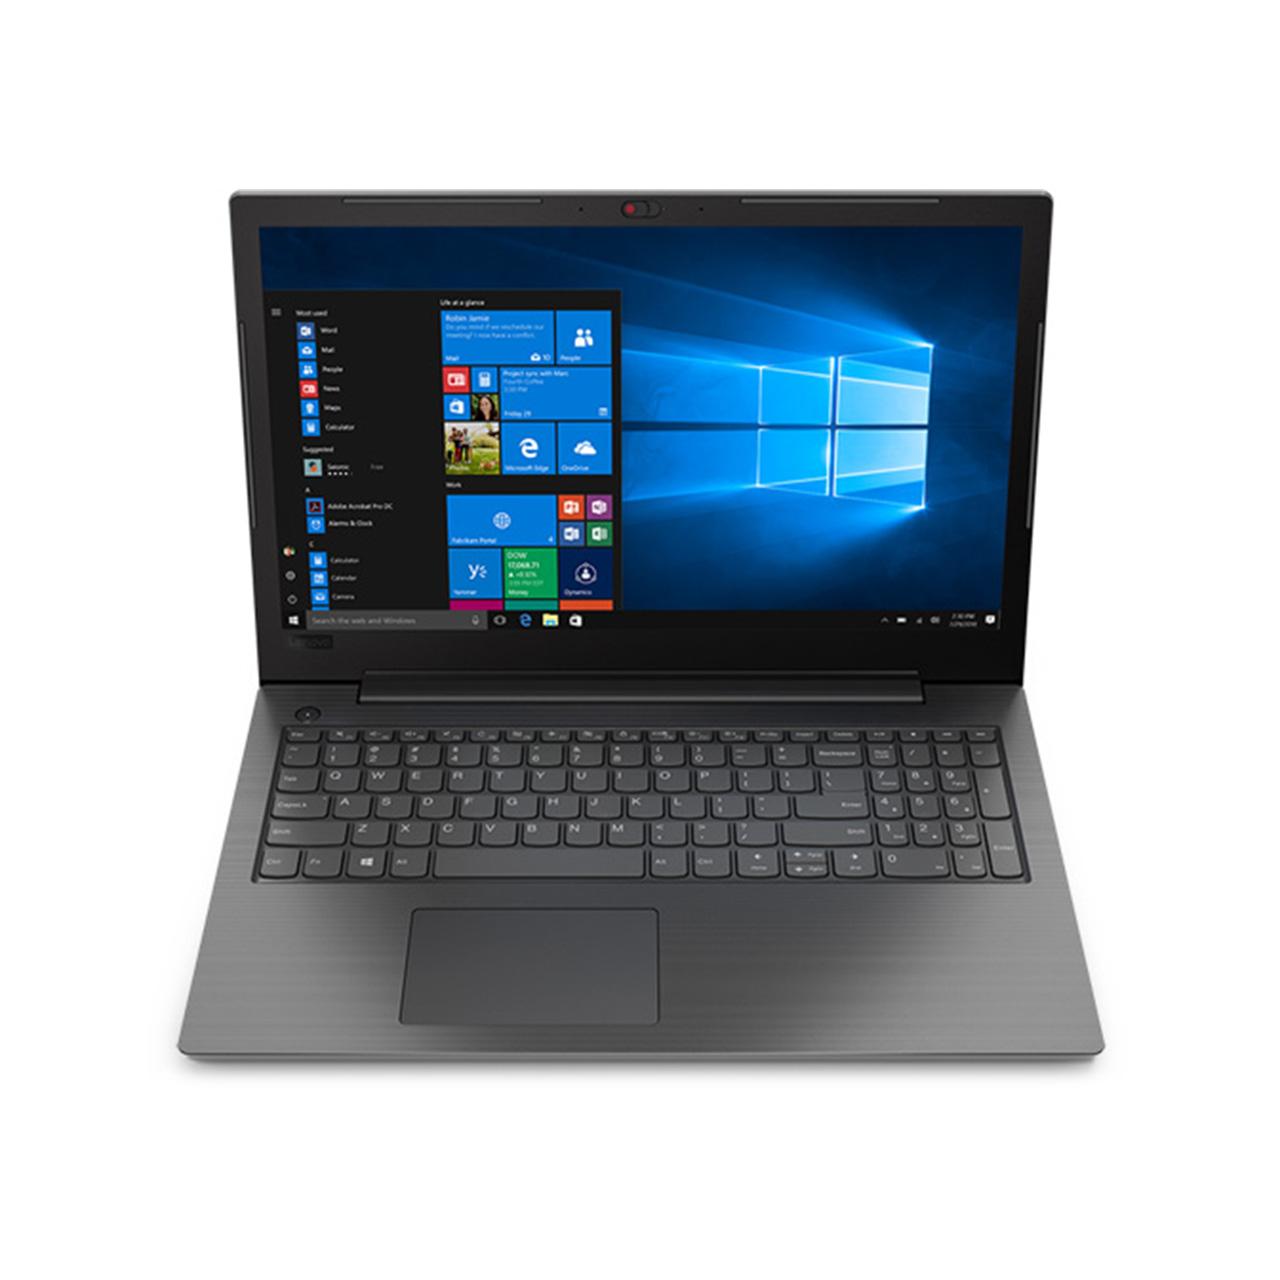 لپ تاپ 15 اینچی لنوو مدل Ideapad V130- D